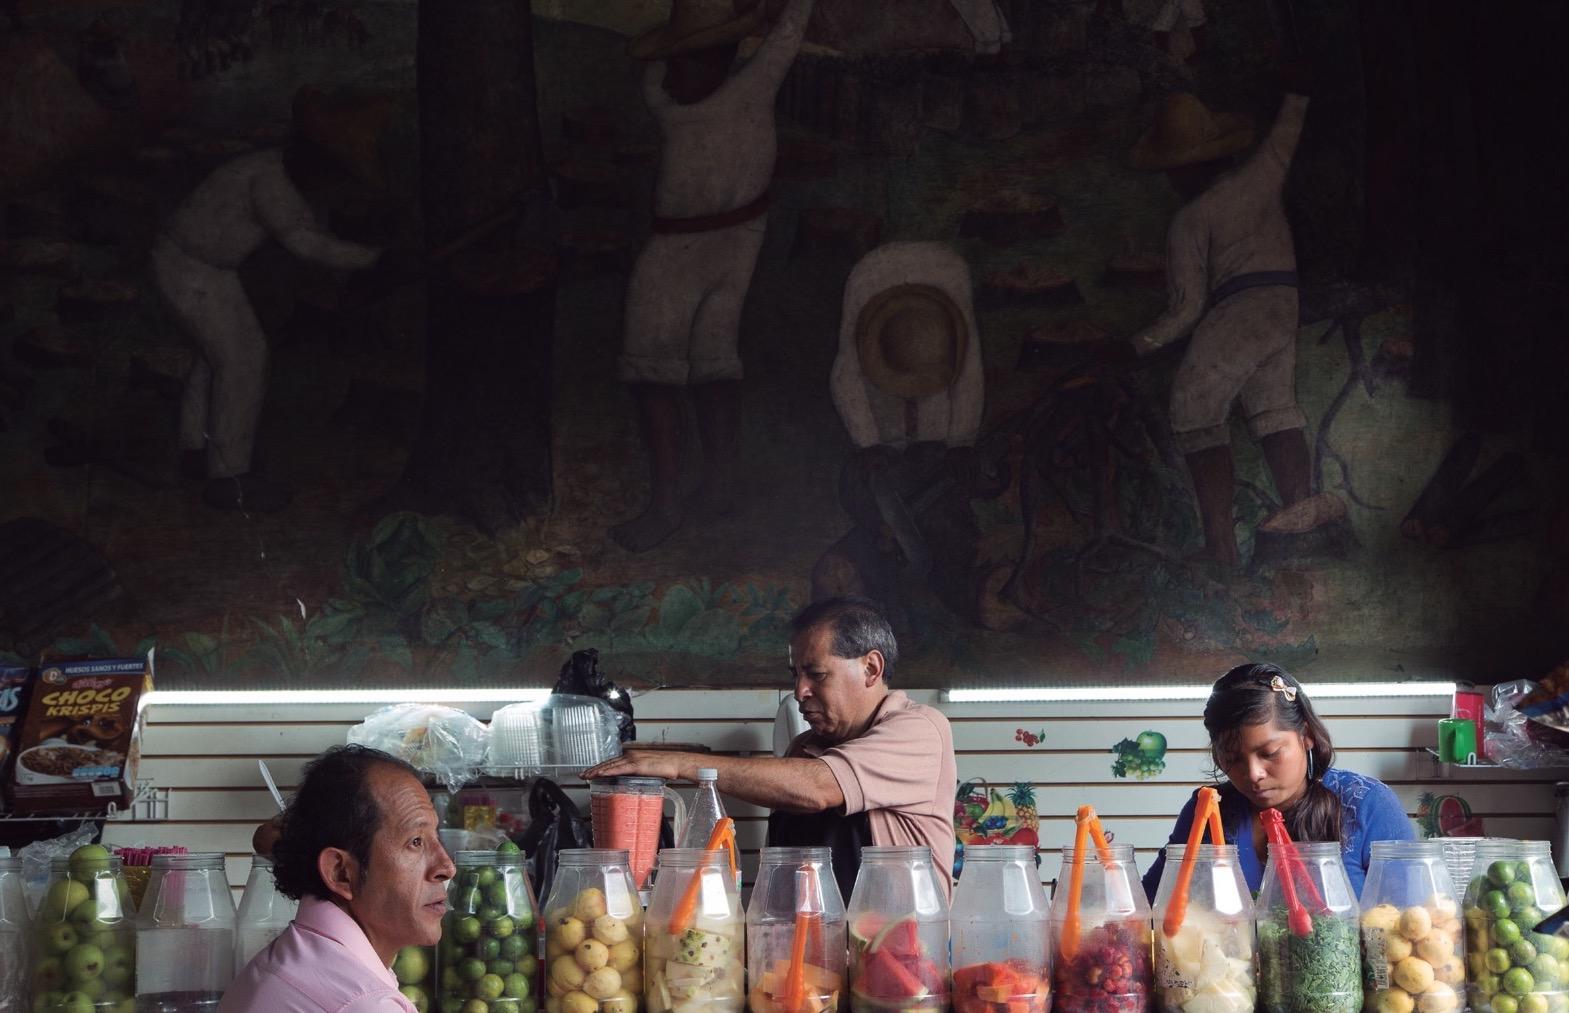 Mercado Abelardo L. Rodriguez